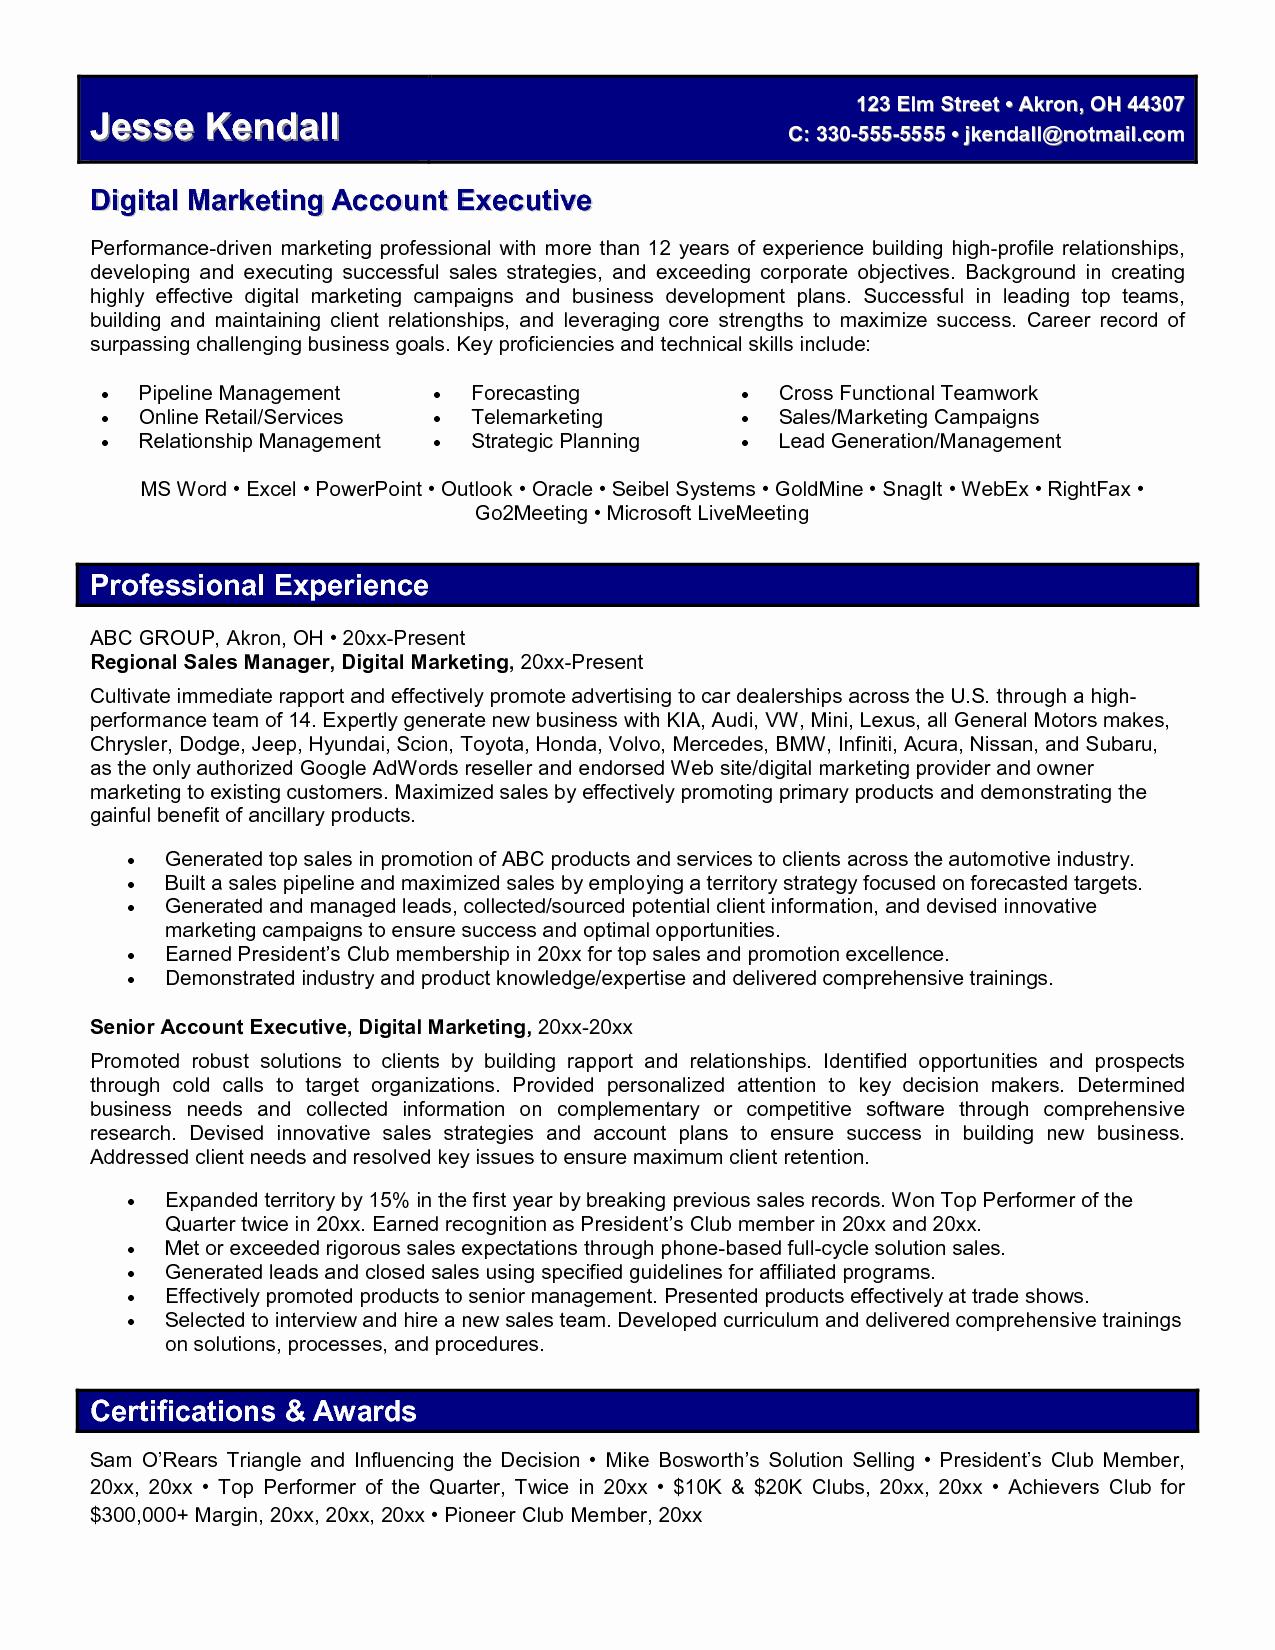 Digital Marketing Resume